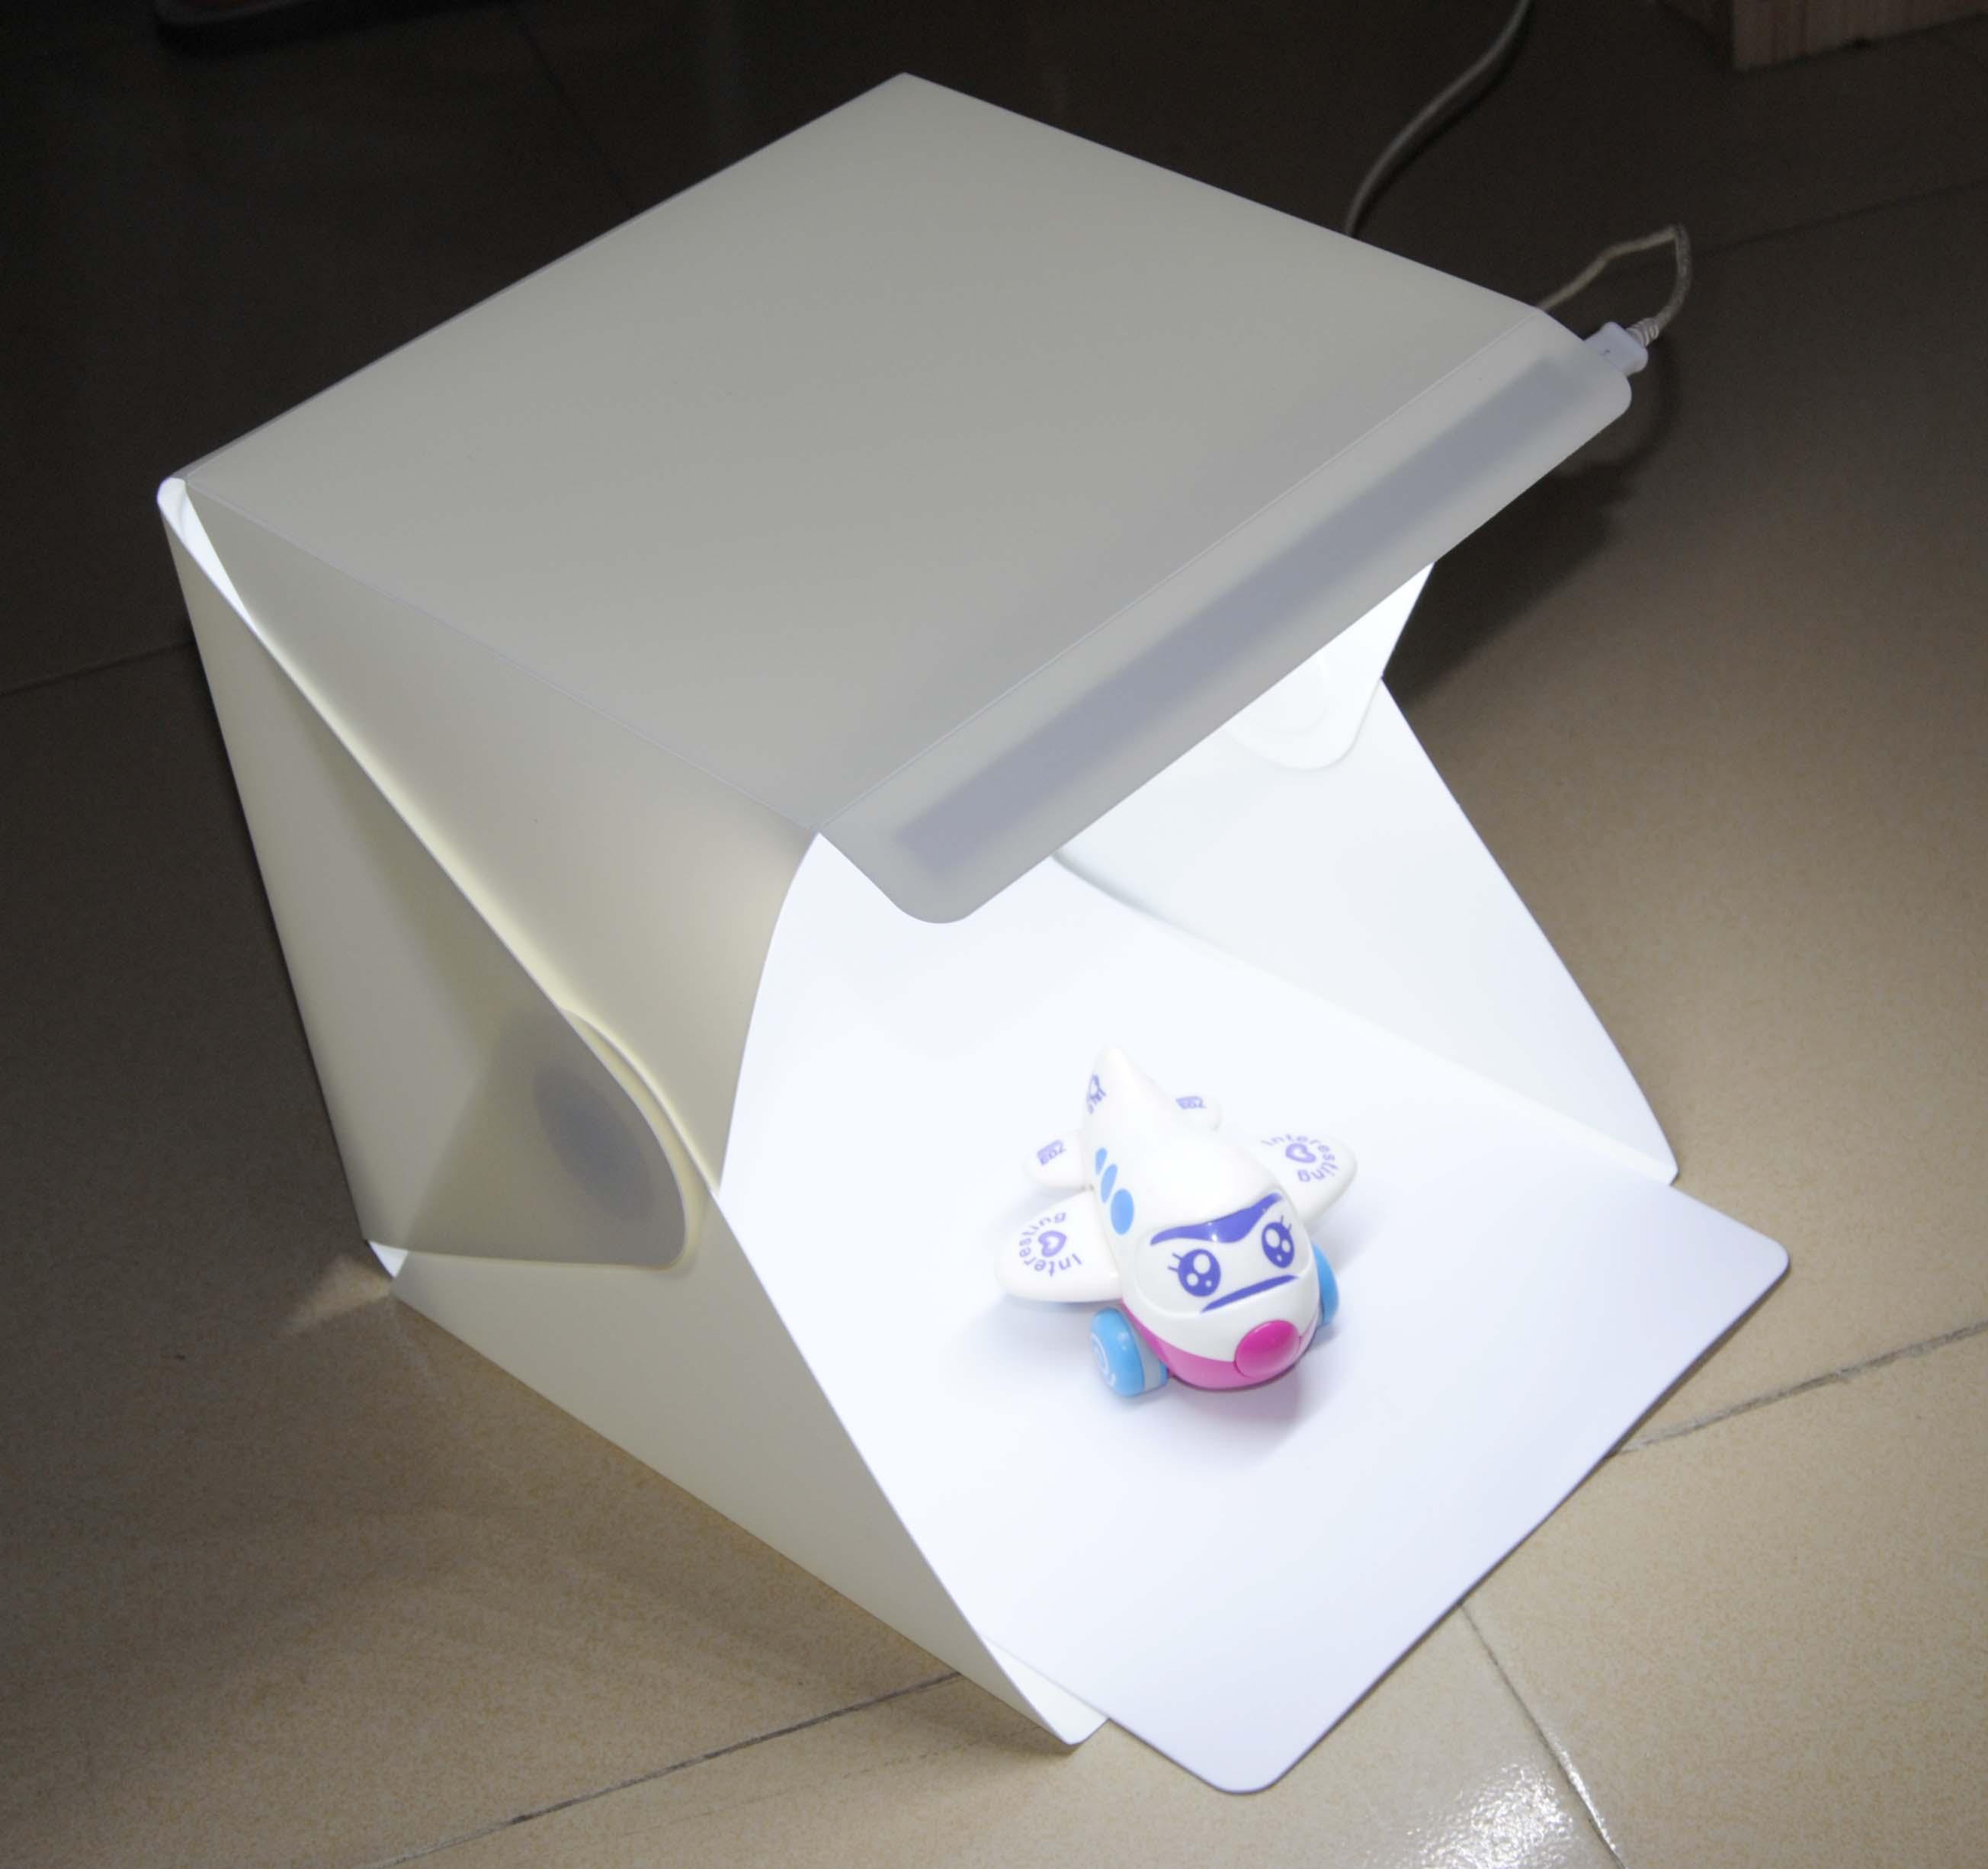 Mini Folding Studio Diffuse Soft Box With LED Light Black White Background Photo Studio Accessories Photo Studio CD50 harman kardon onyx studio 2 black